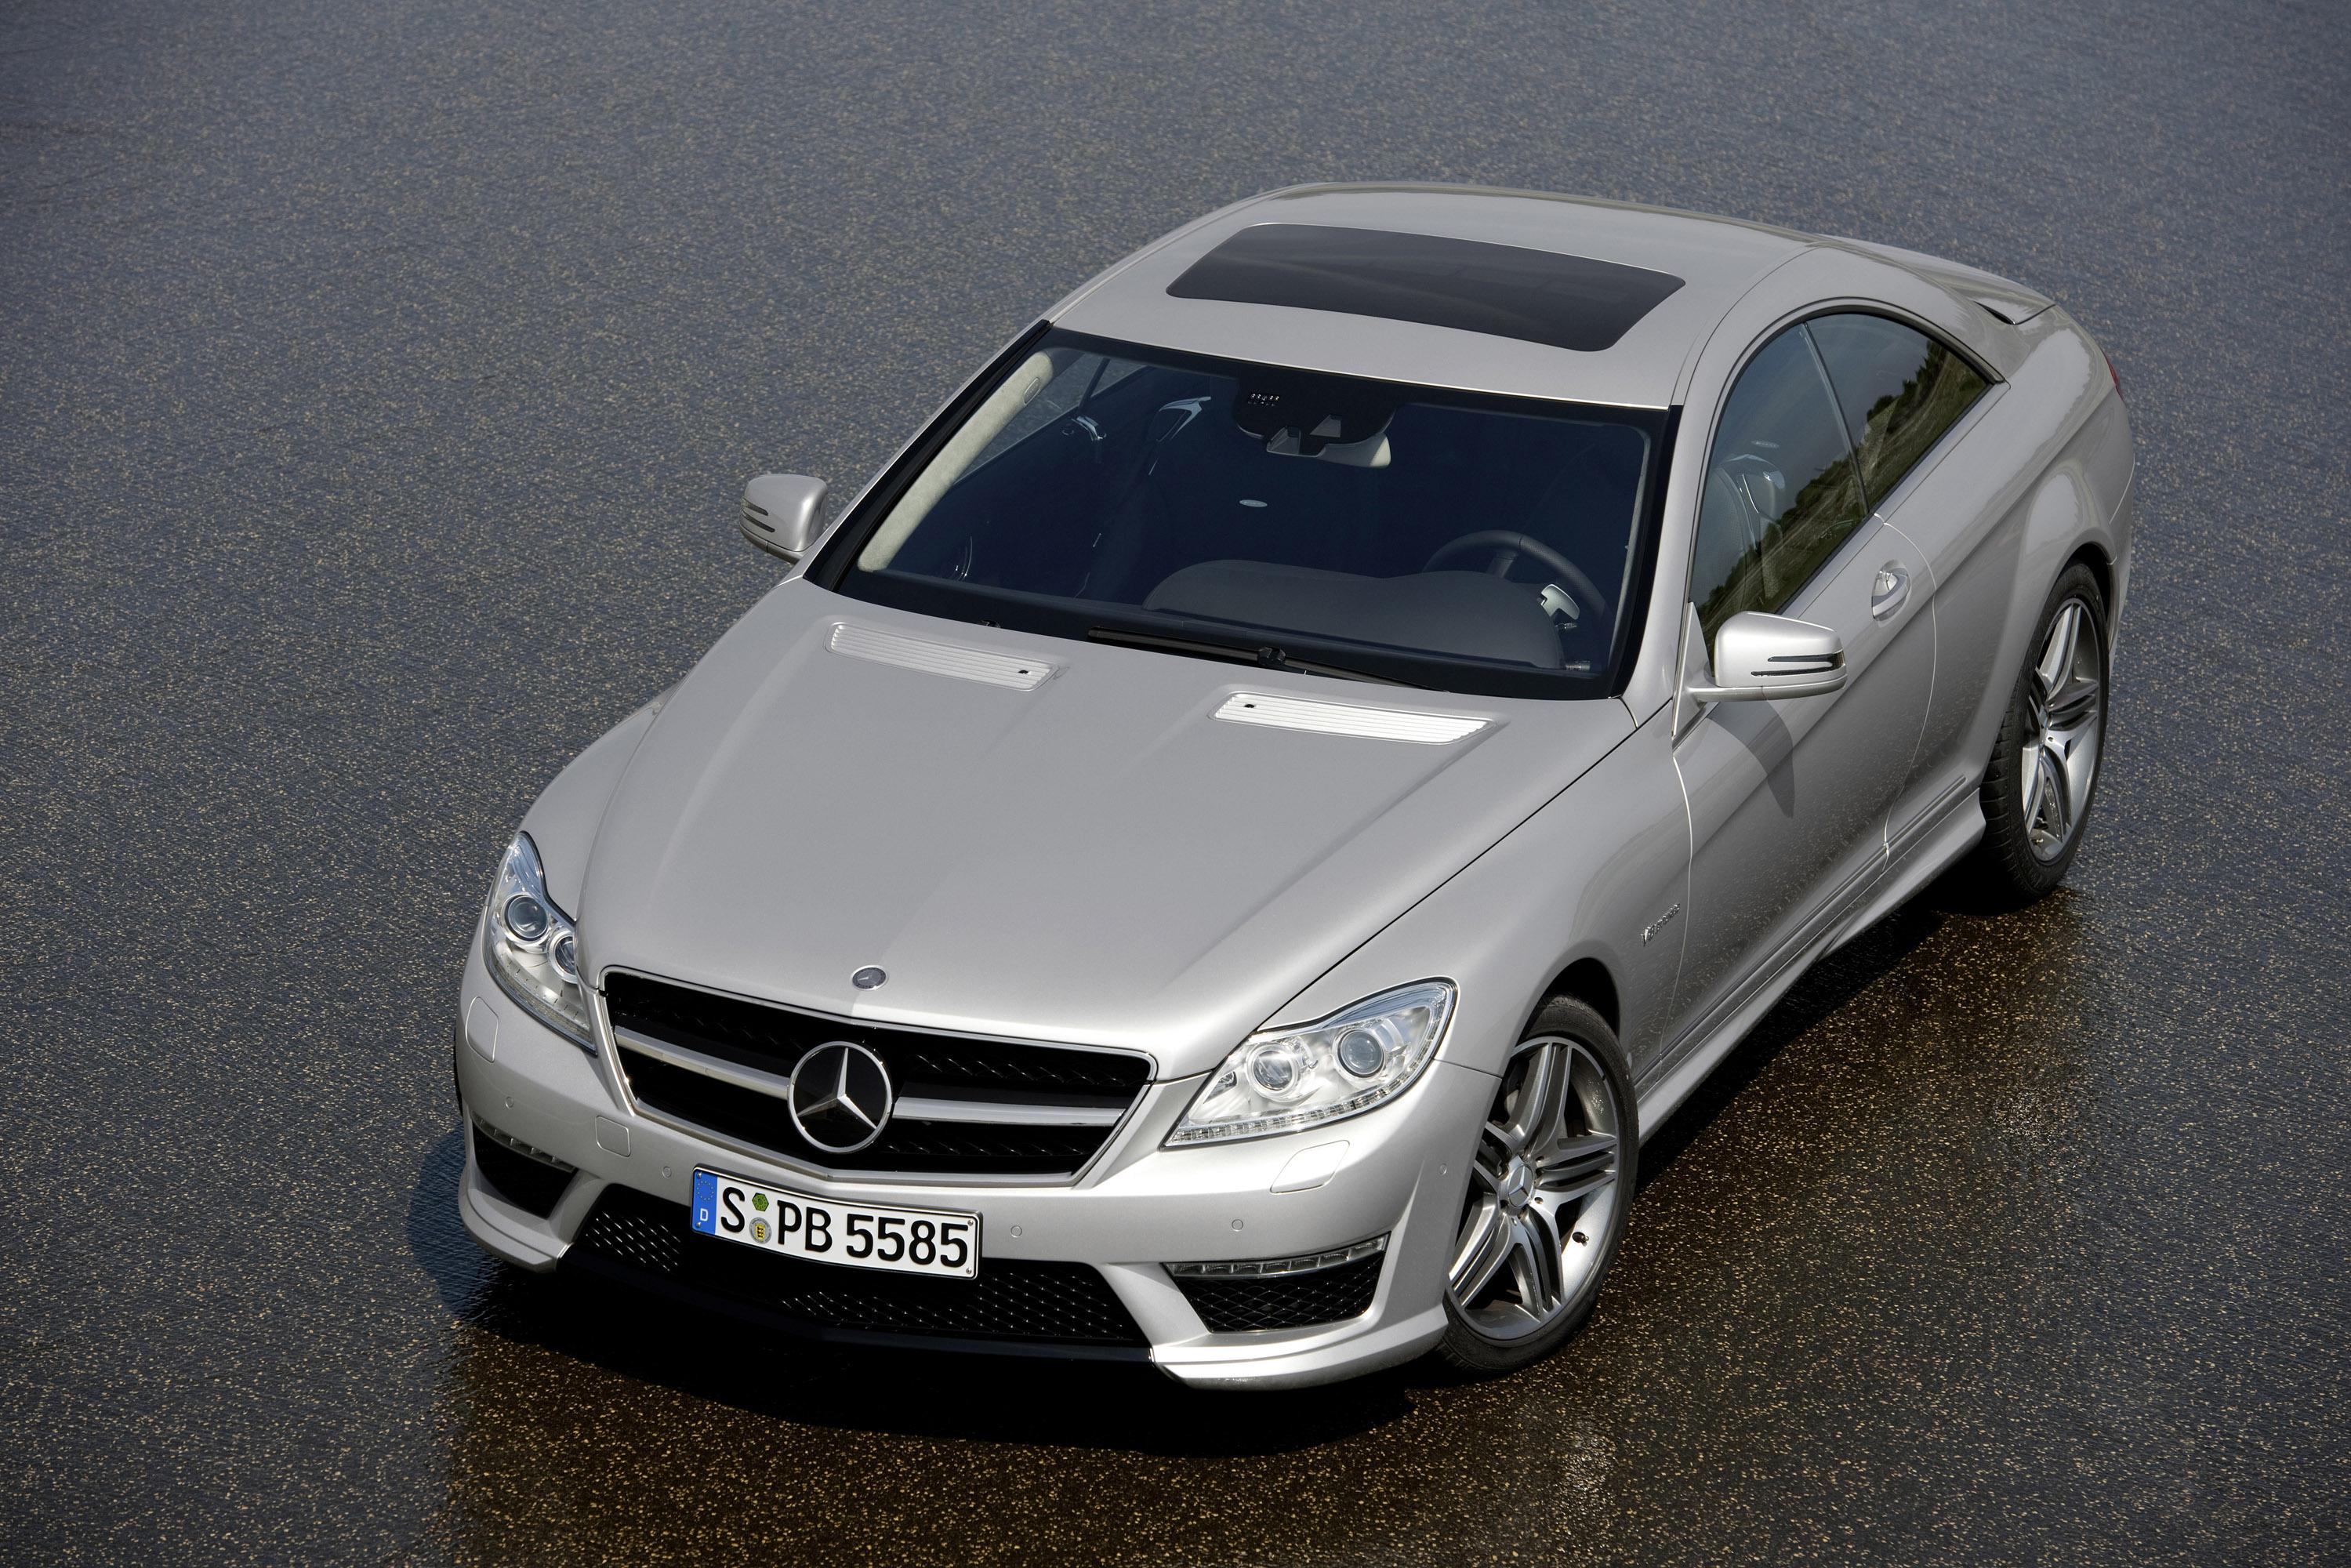 Mercedes-Benz CL63 AMG photo #1